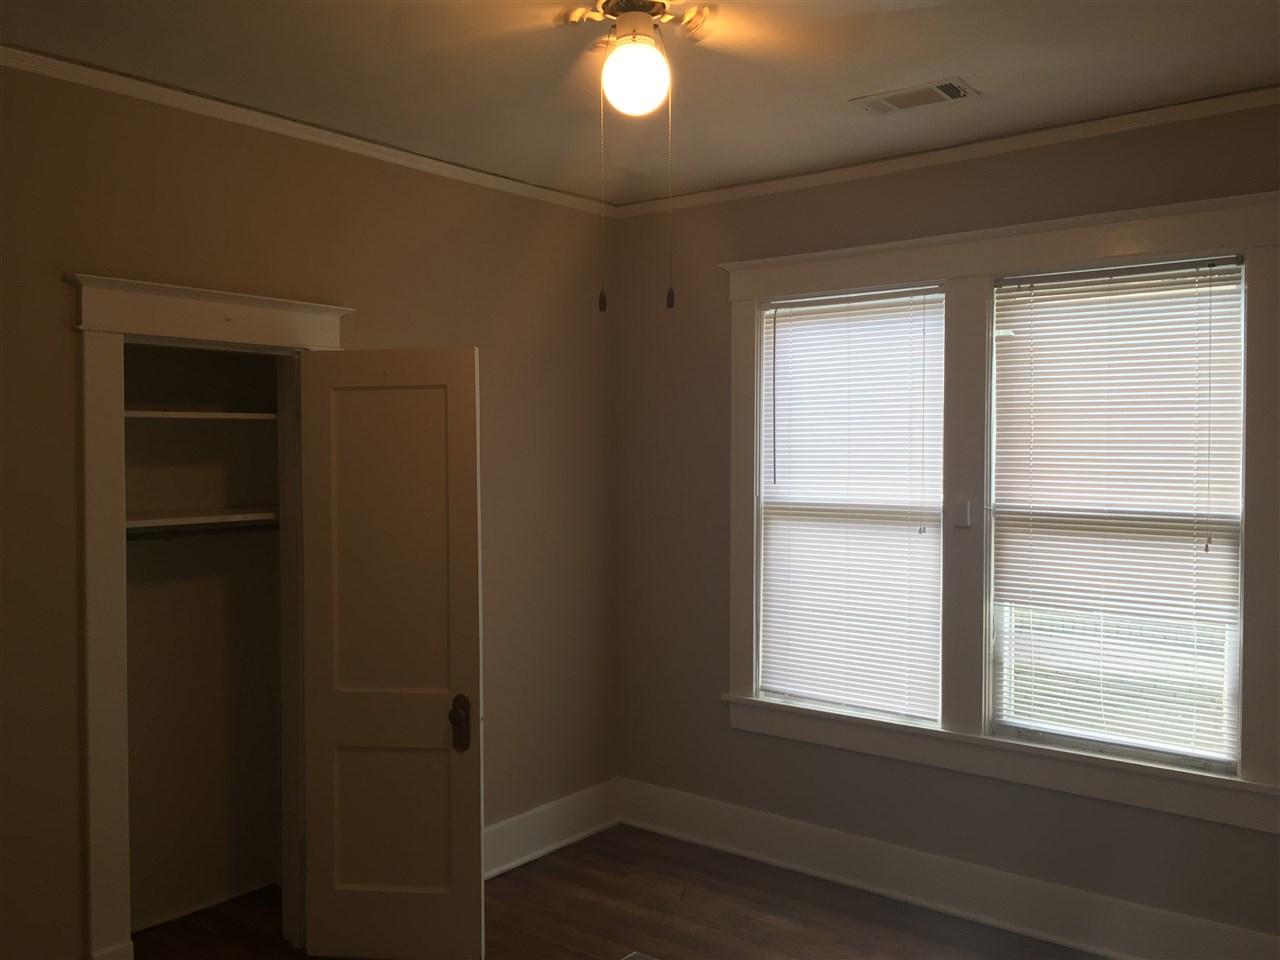 1366 Tutwiler Memphis, TN 38107 - MLS #: 10012945